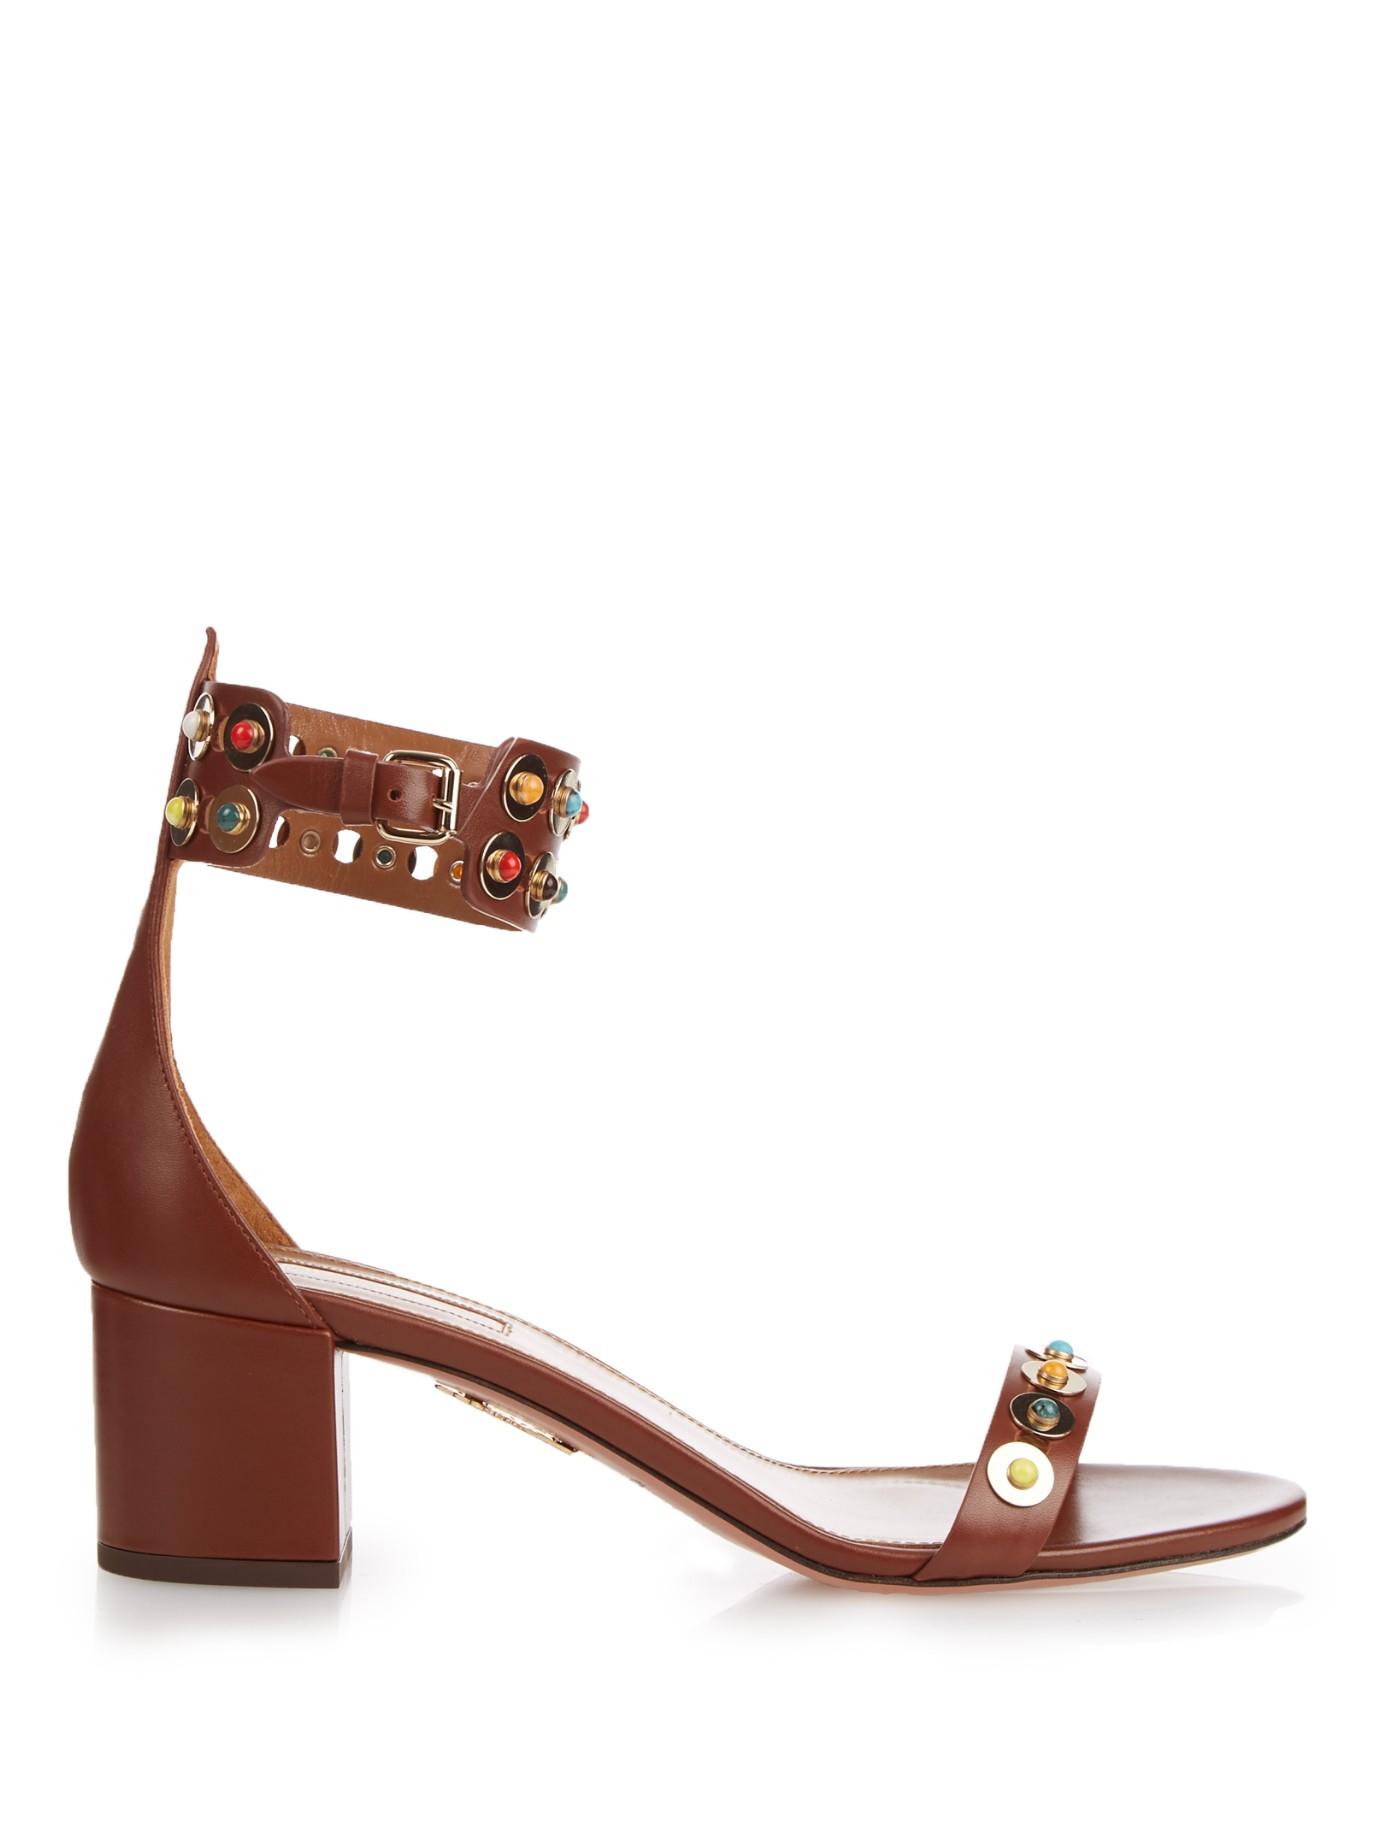 508a6a4f1 Lyst - Aquazzura Byzantine Embellished Leather Sandals in Brown